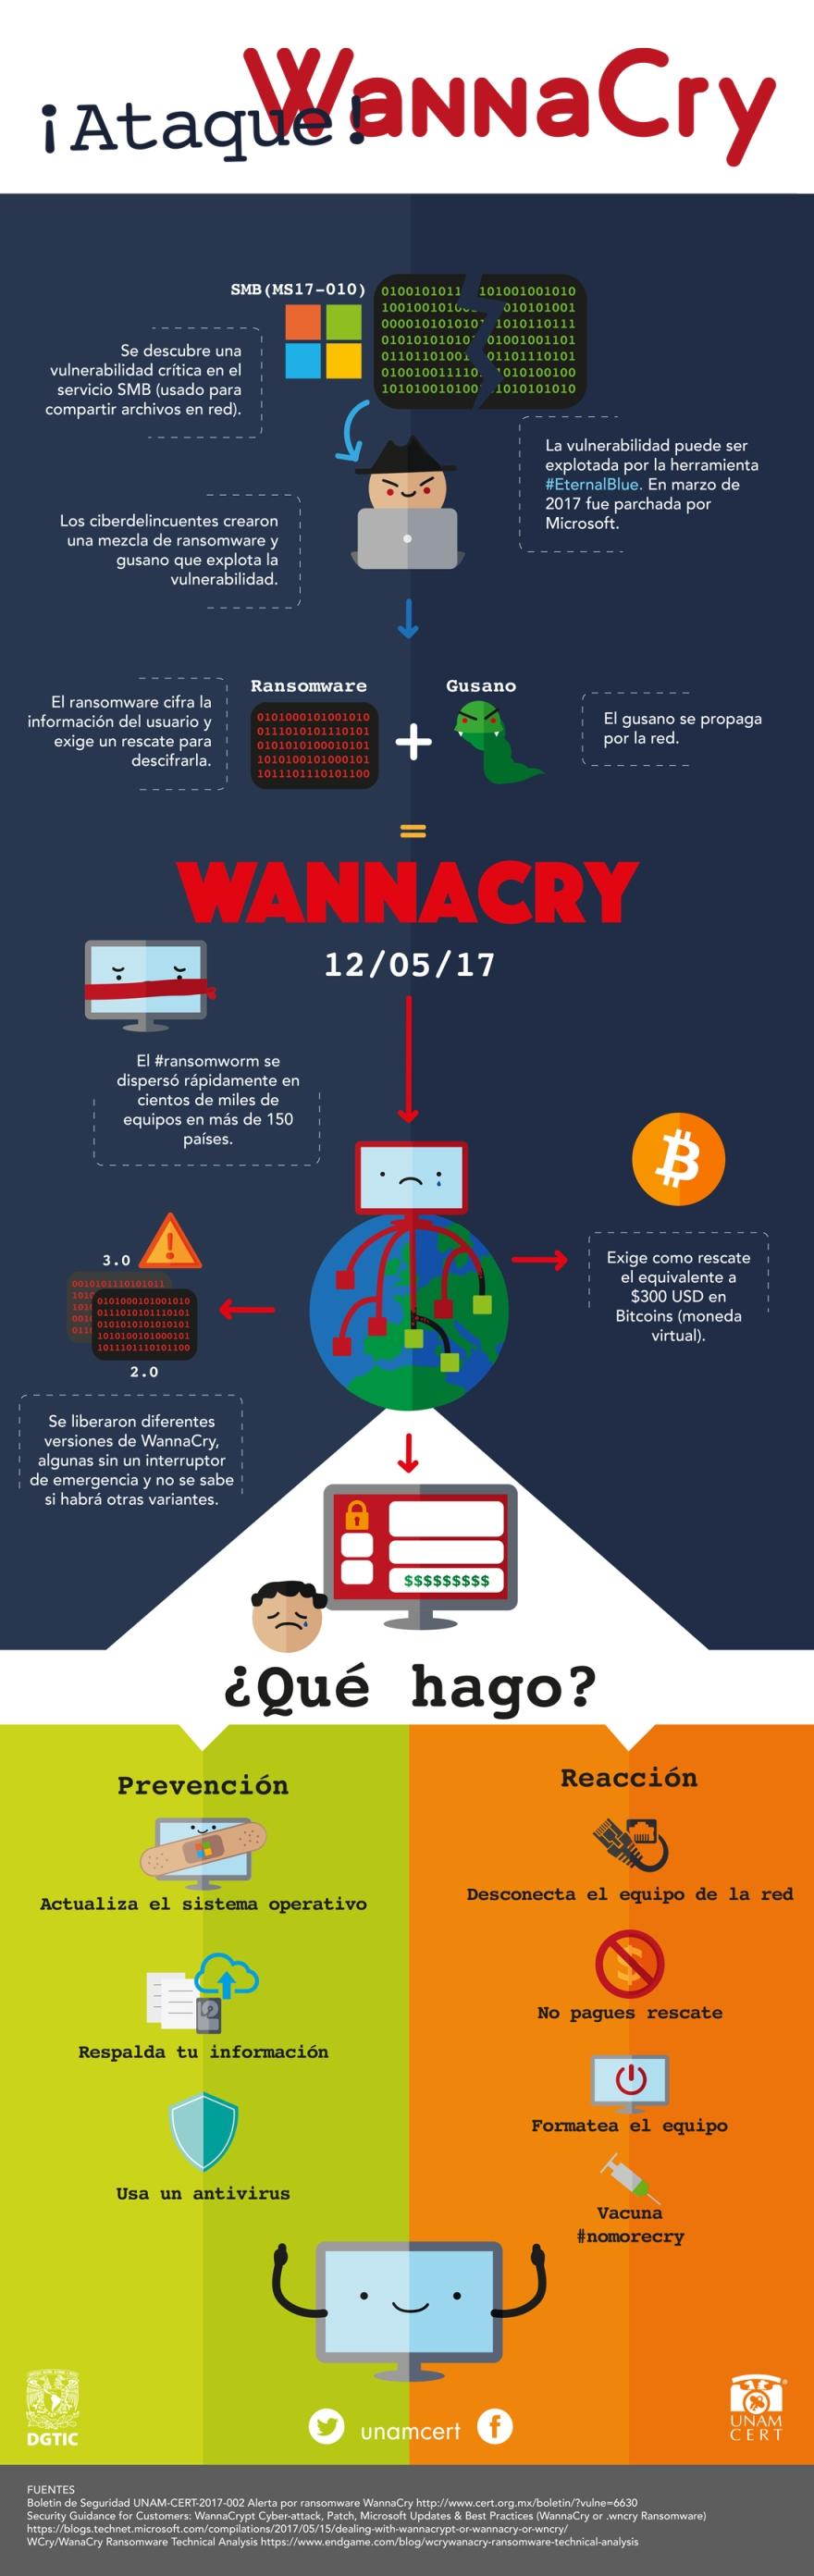 infografia_wannacry